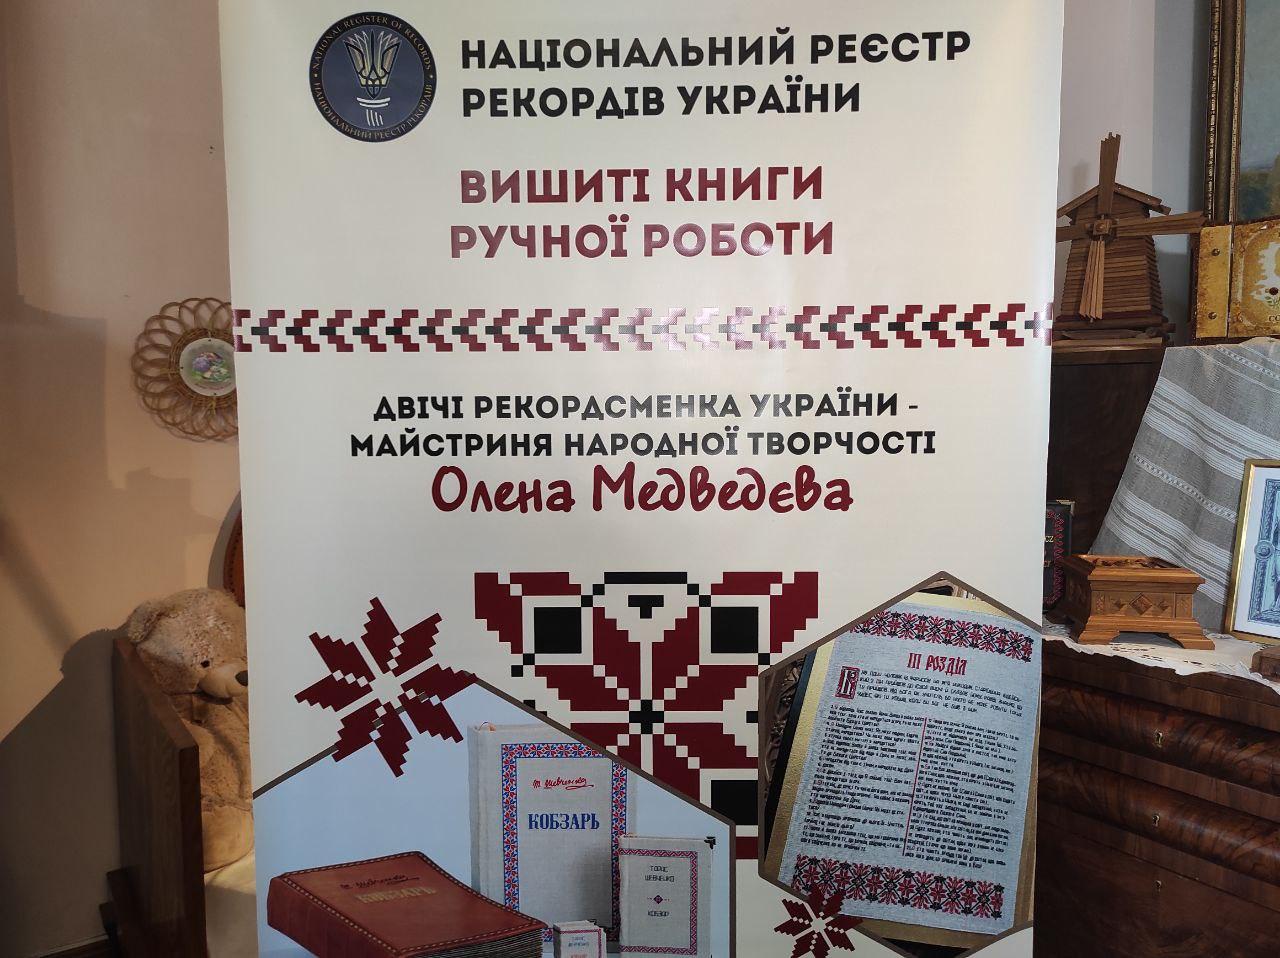 На Рівненщині встановили рекорд України (ФОТО), фото-10